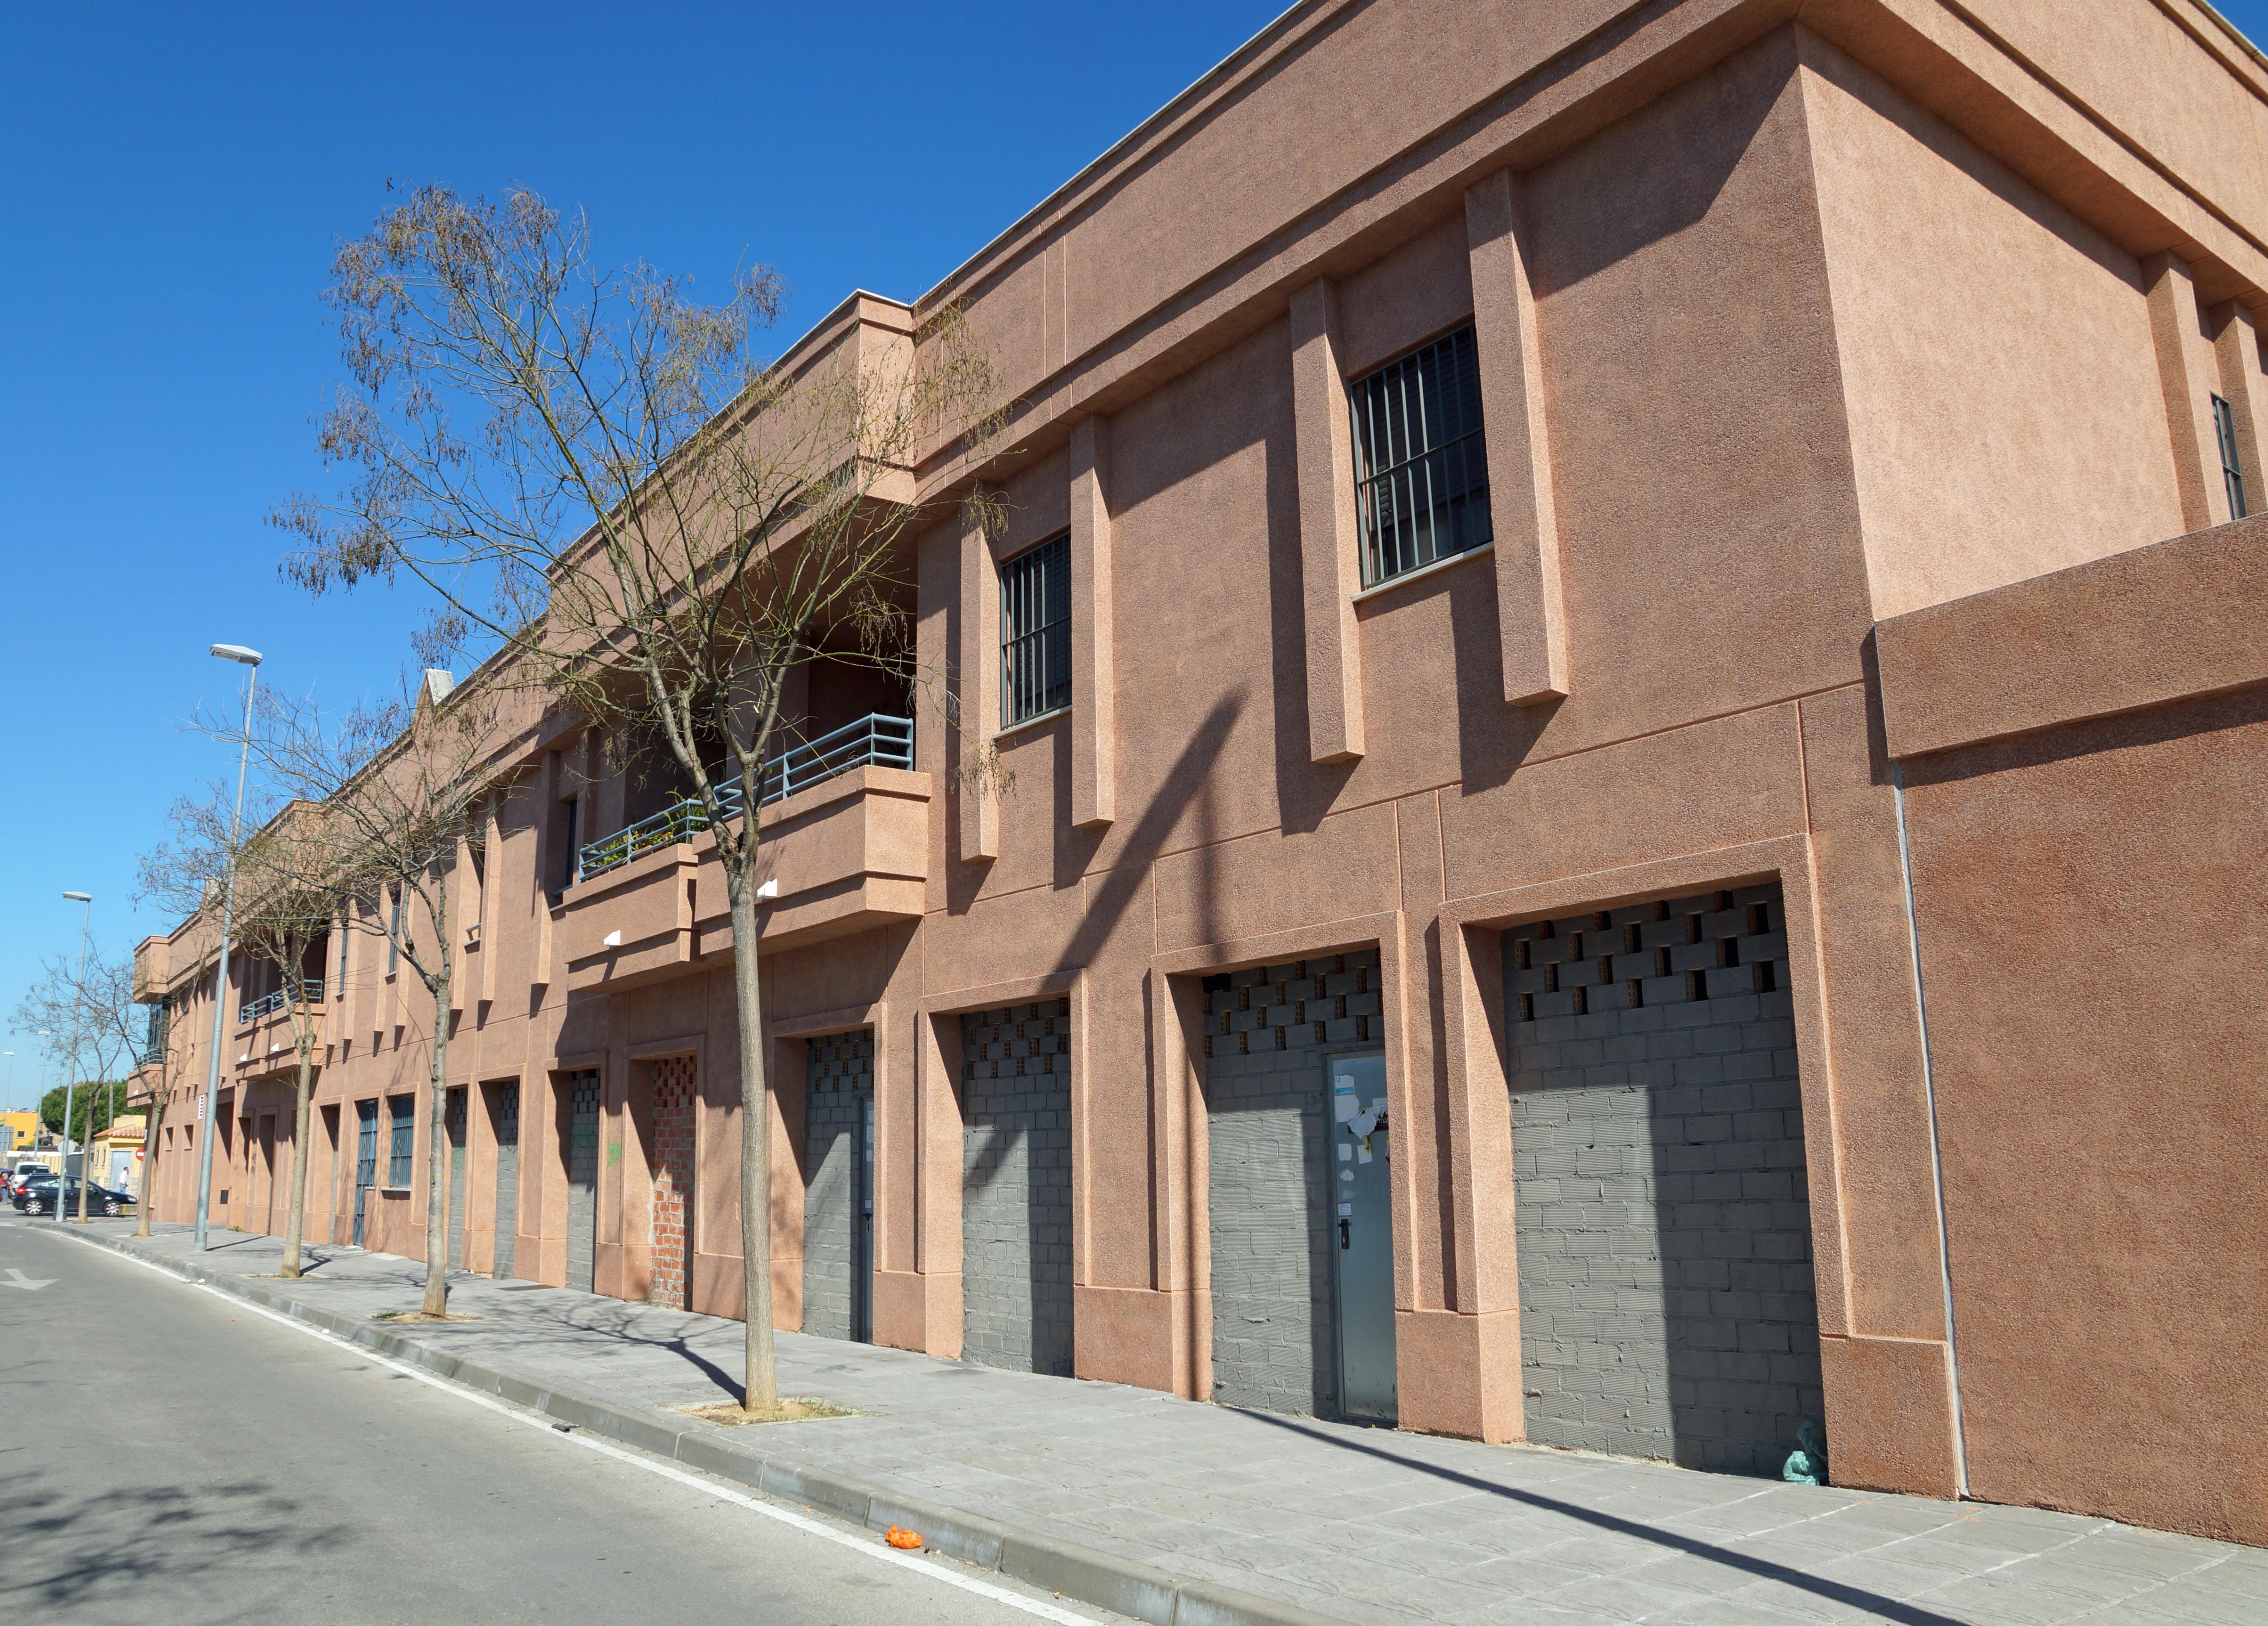 Local en venta en Estella del Marqués, Jerez de la Frontera, Cádiz, Calle Periodista Juan Andres Garcia, 40.000 €, 47 m2